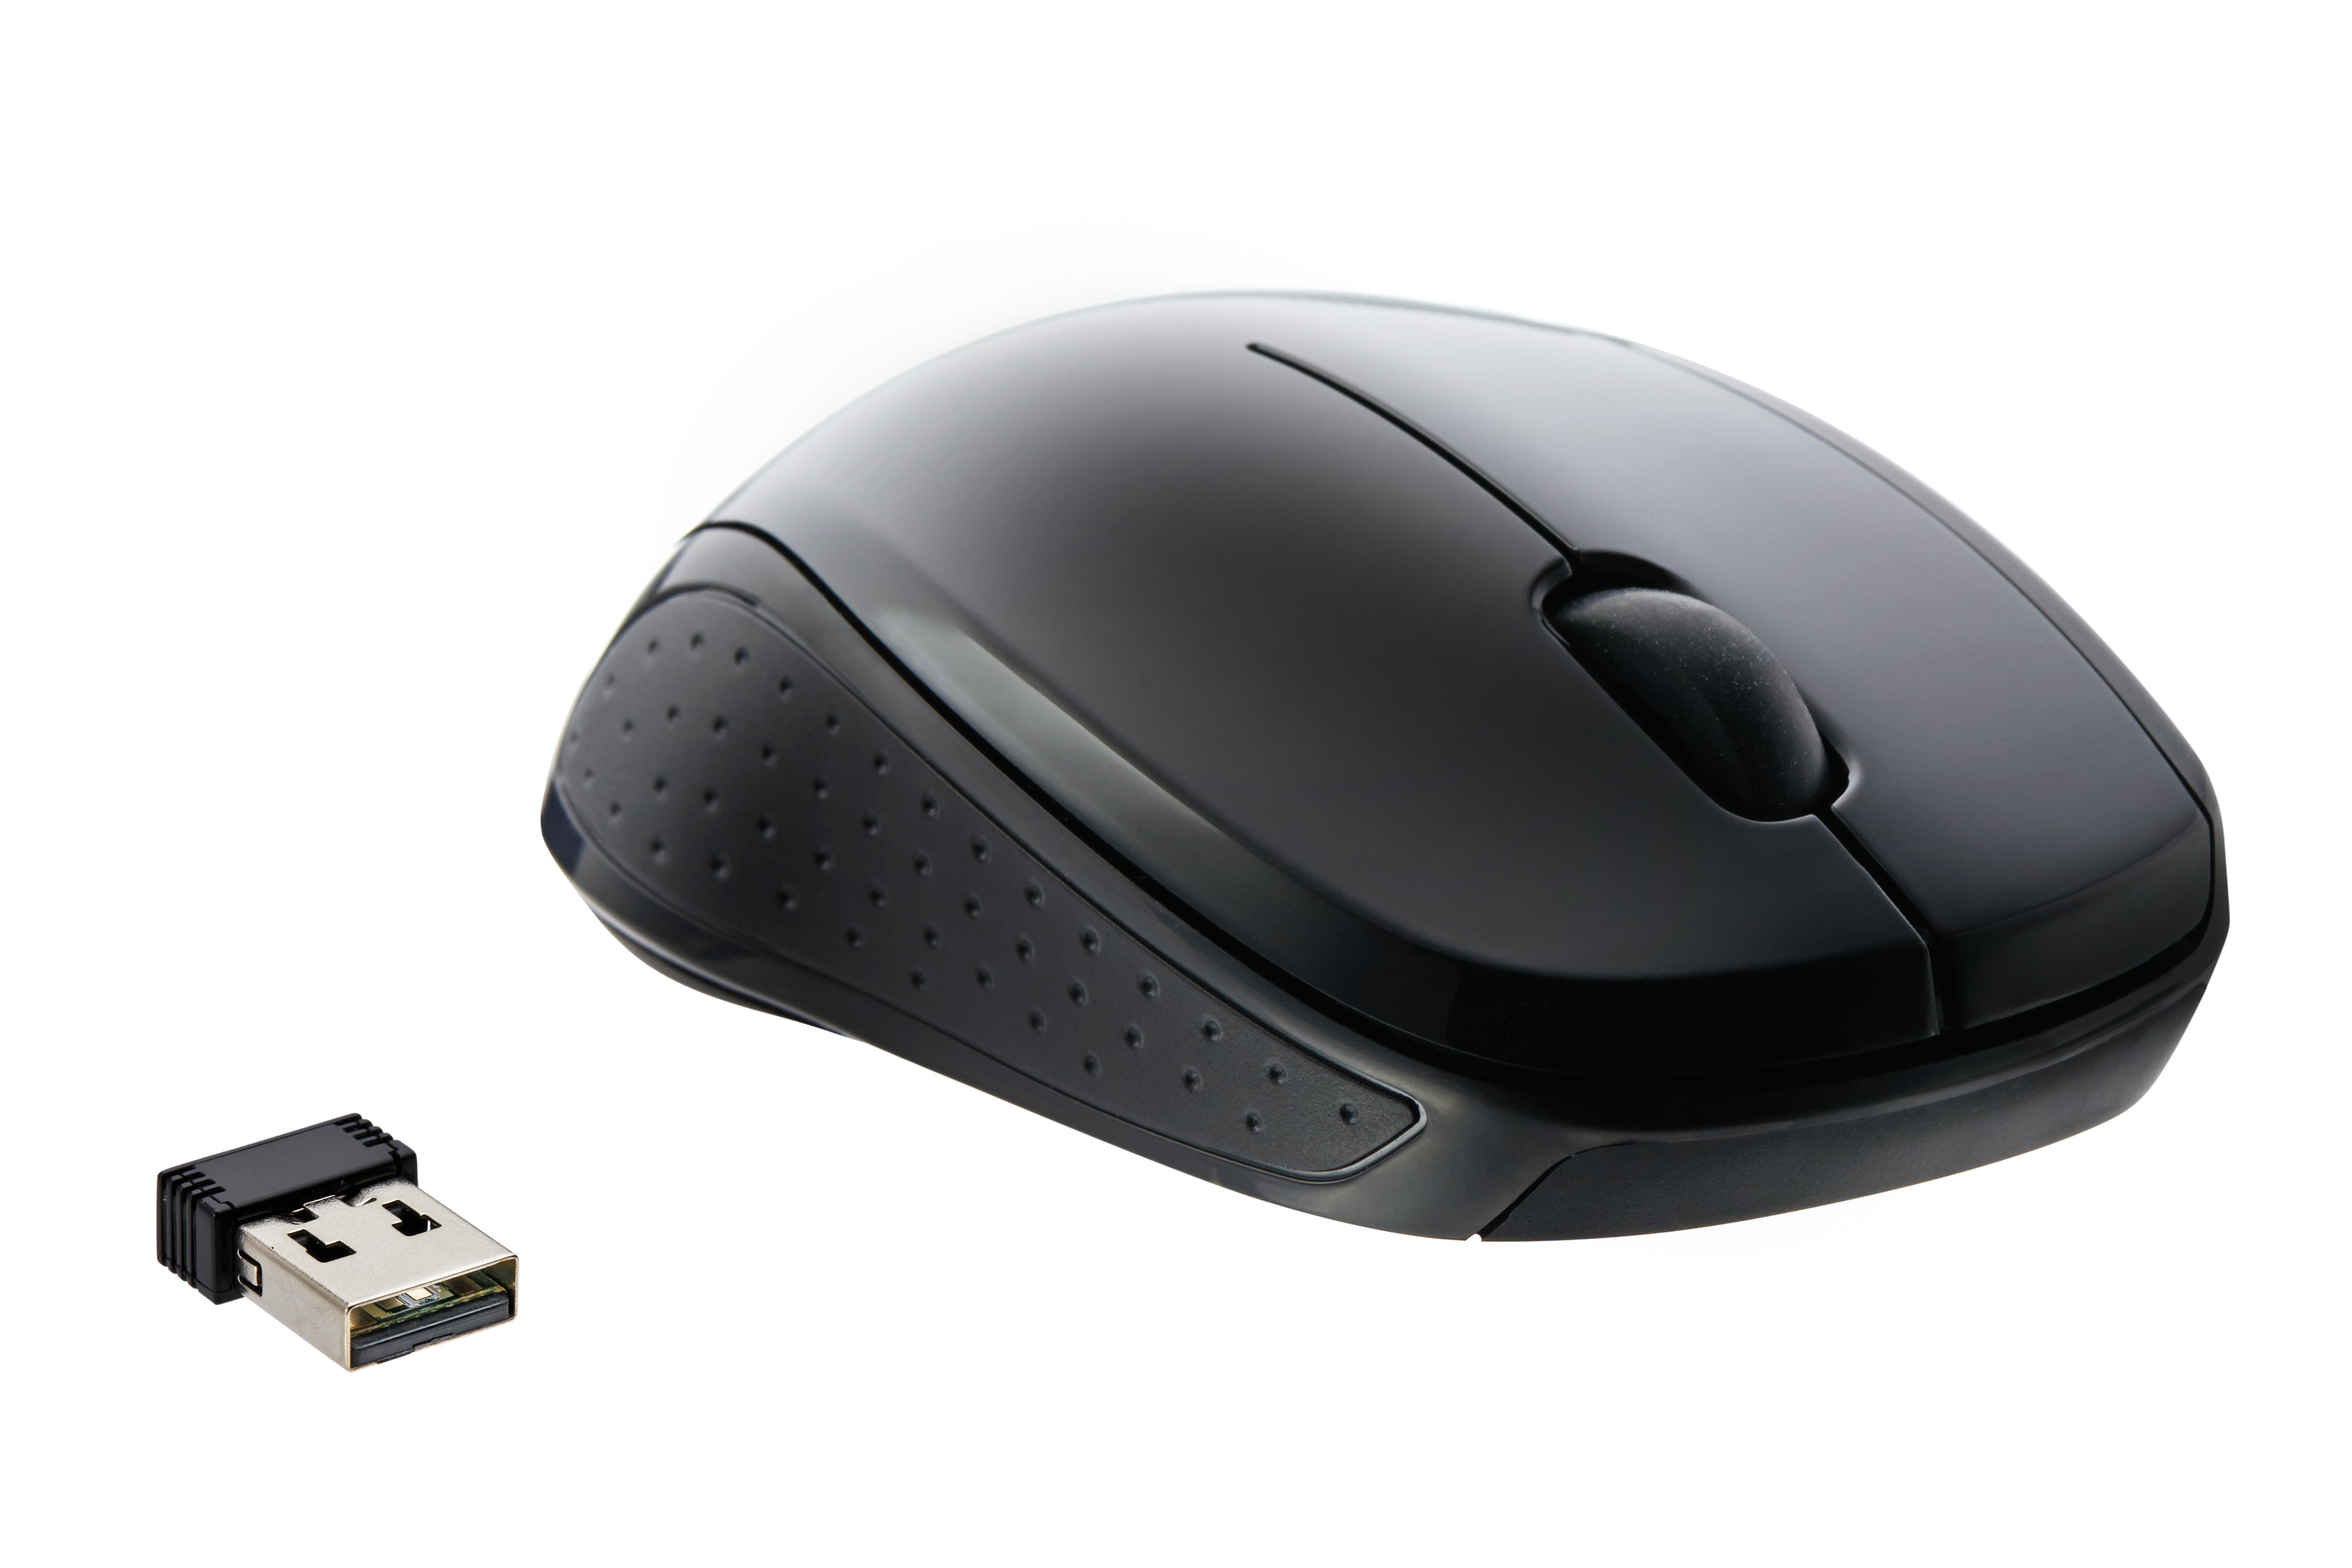 W571 Wireless Optical Mouse Black